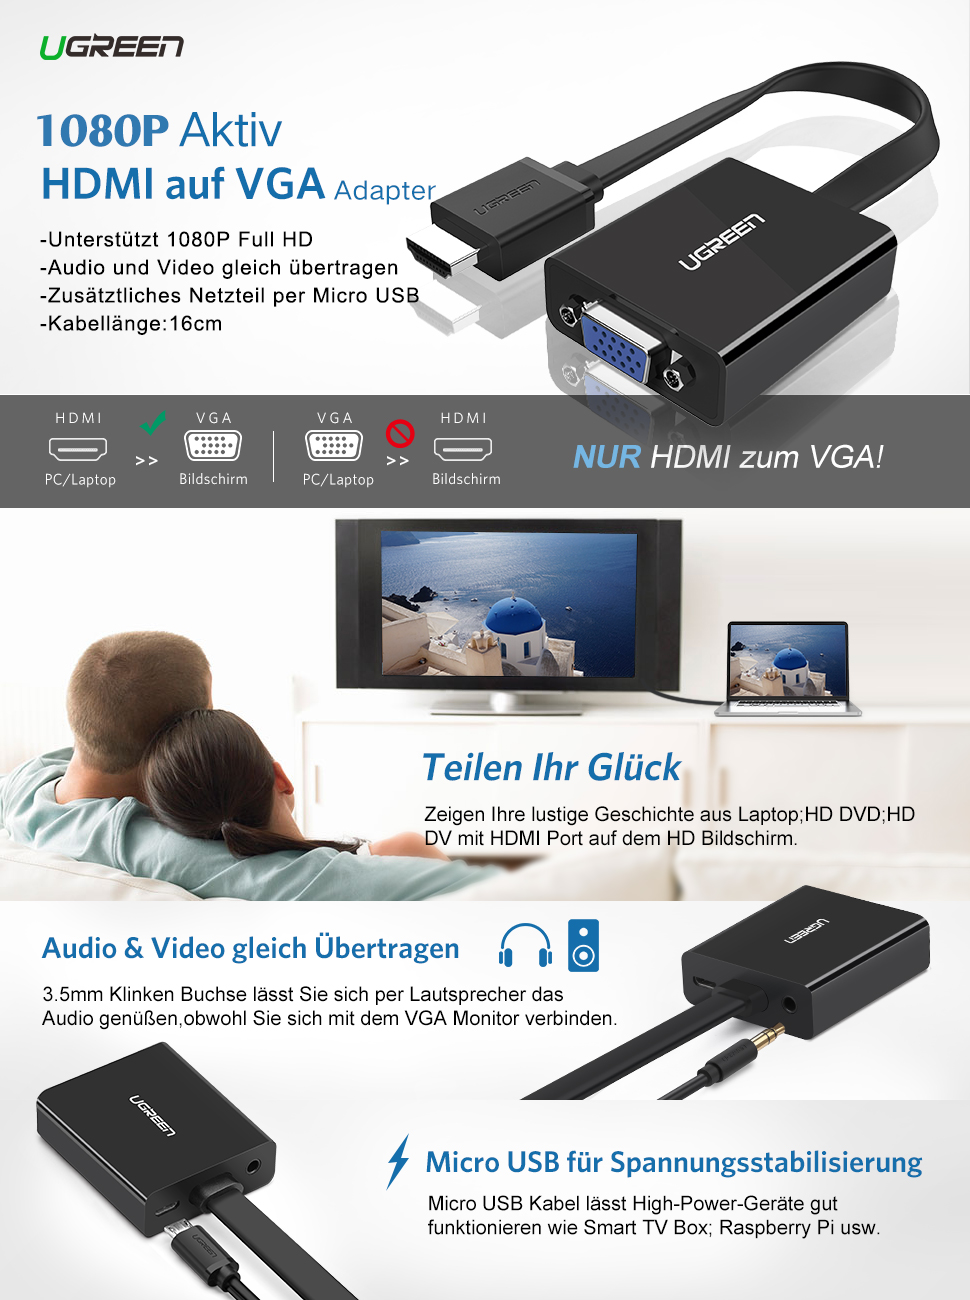 UGREEN HDMI auf VGA kabel Adapter 1080P HDTV Aktiv: Amazon.de ...